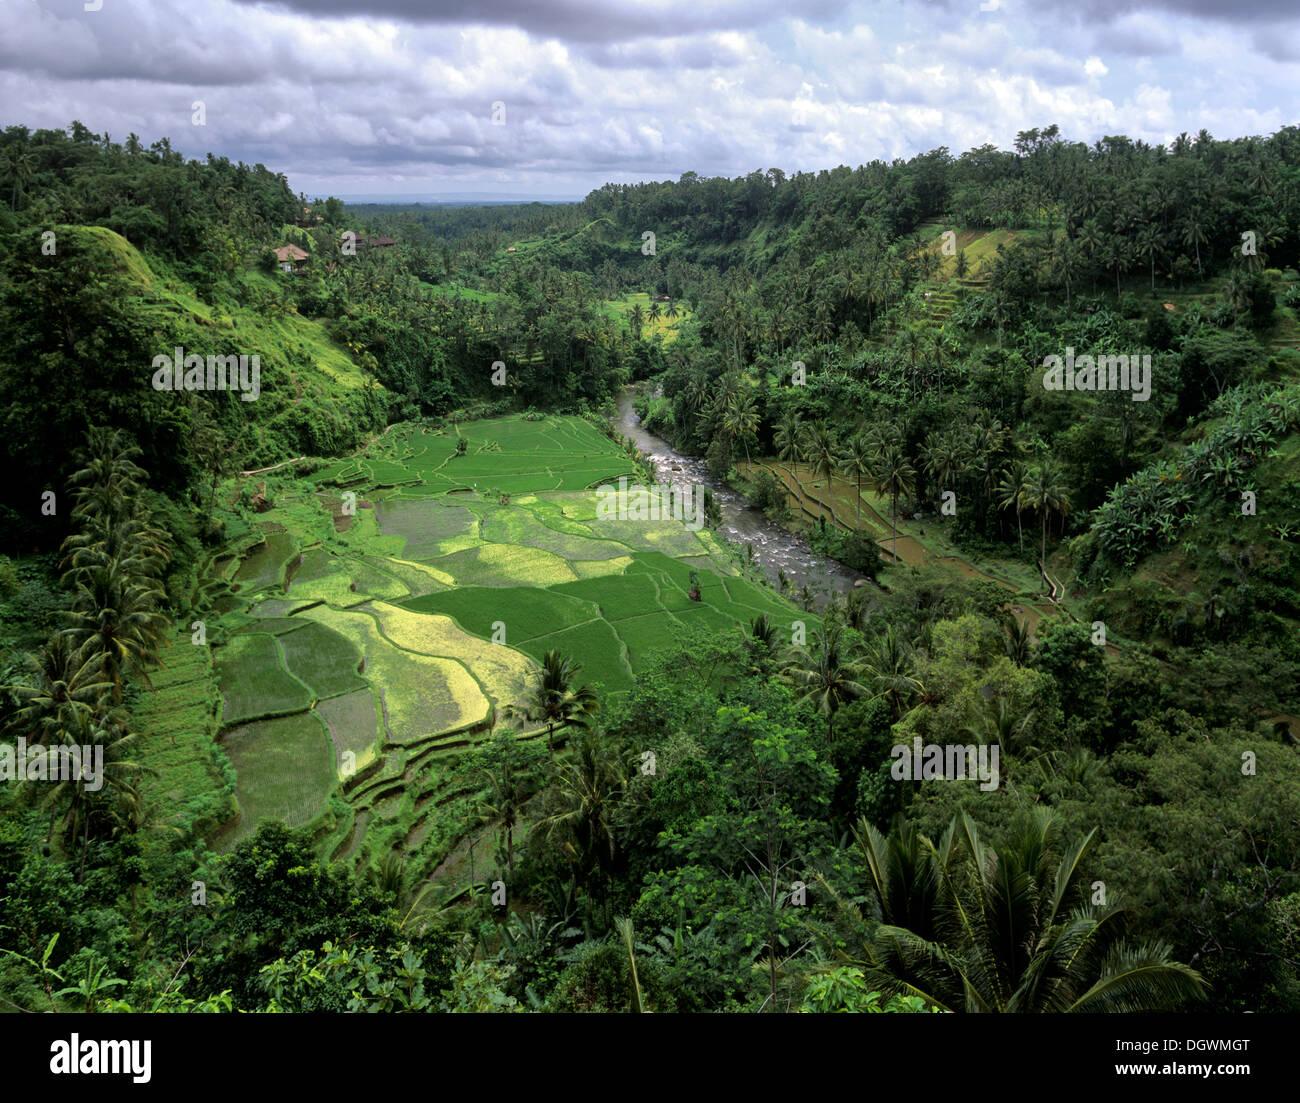 Rice paddies, terrassed fields and coconut trees, Ubud, Bali, Südostasien, Indonesia - Stock Image